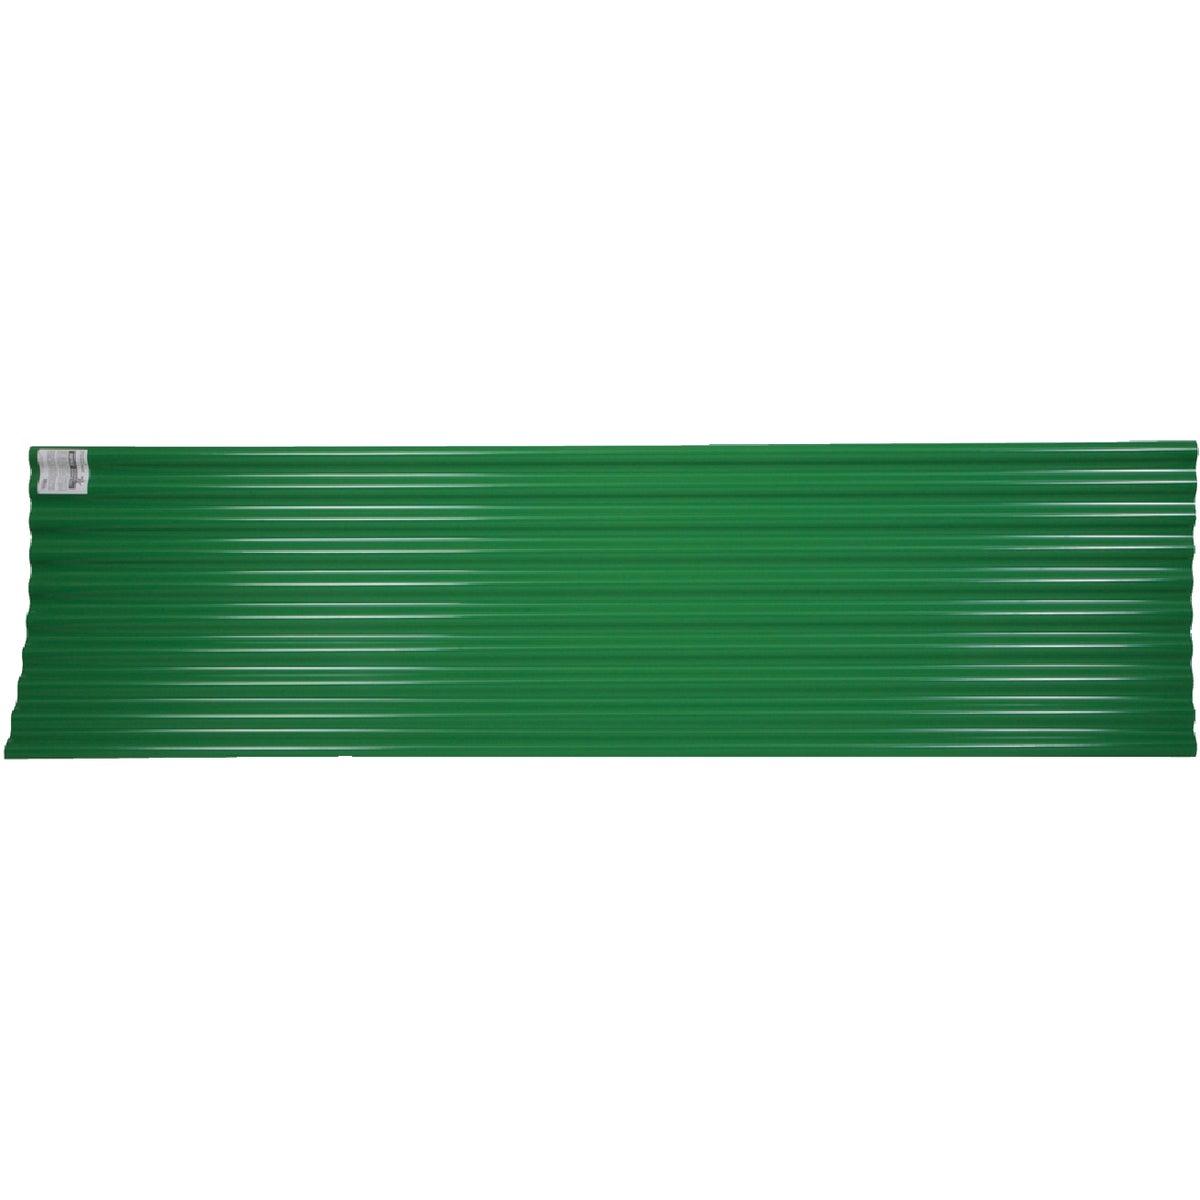 12' GRN CORGTD PVC PANEL